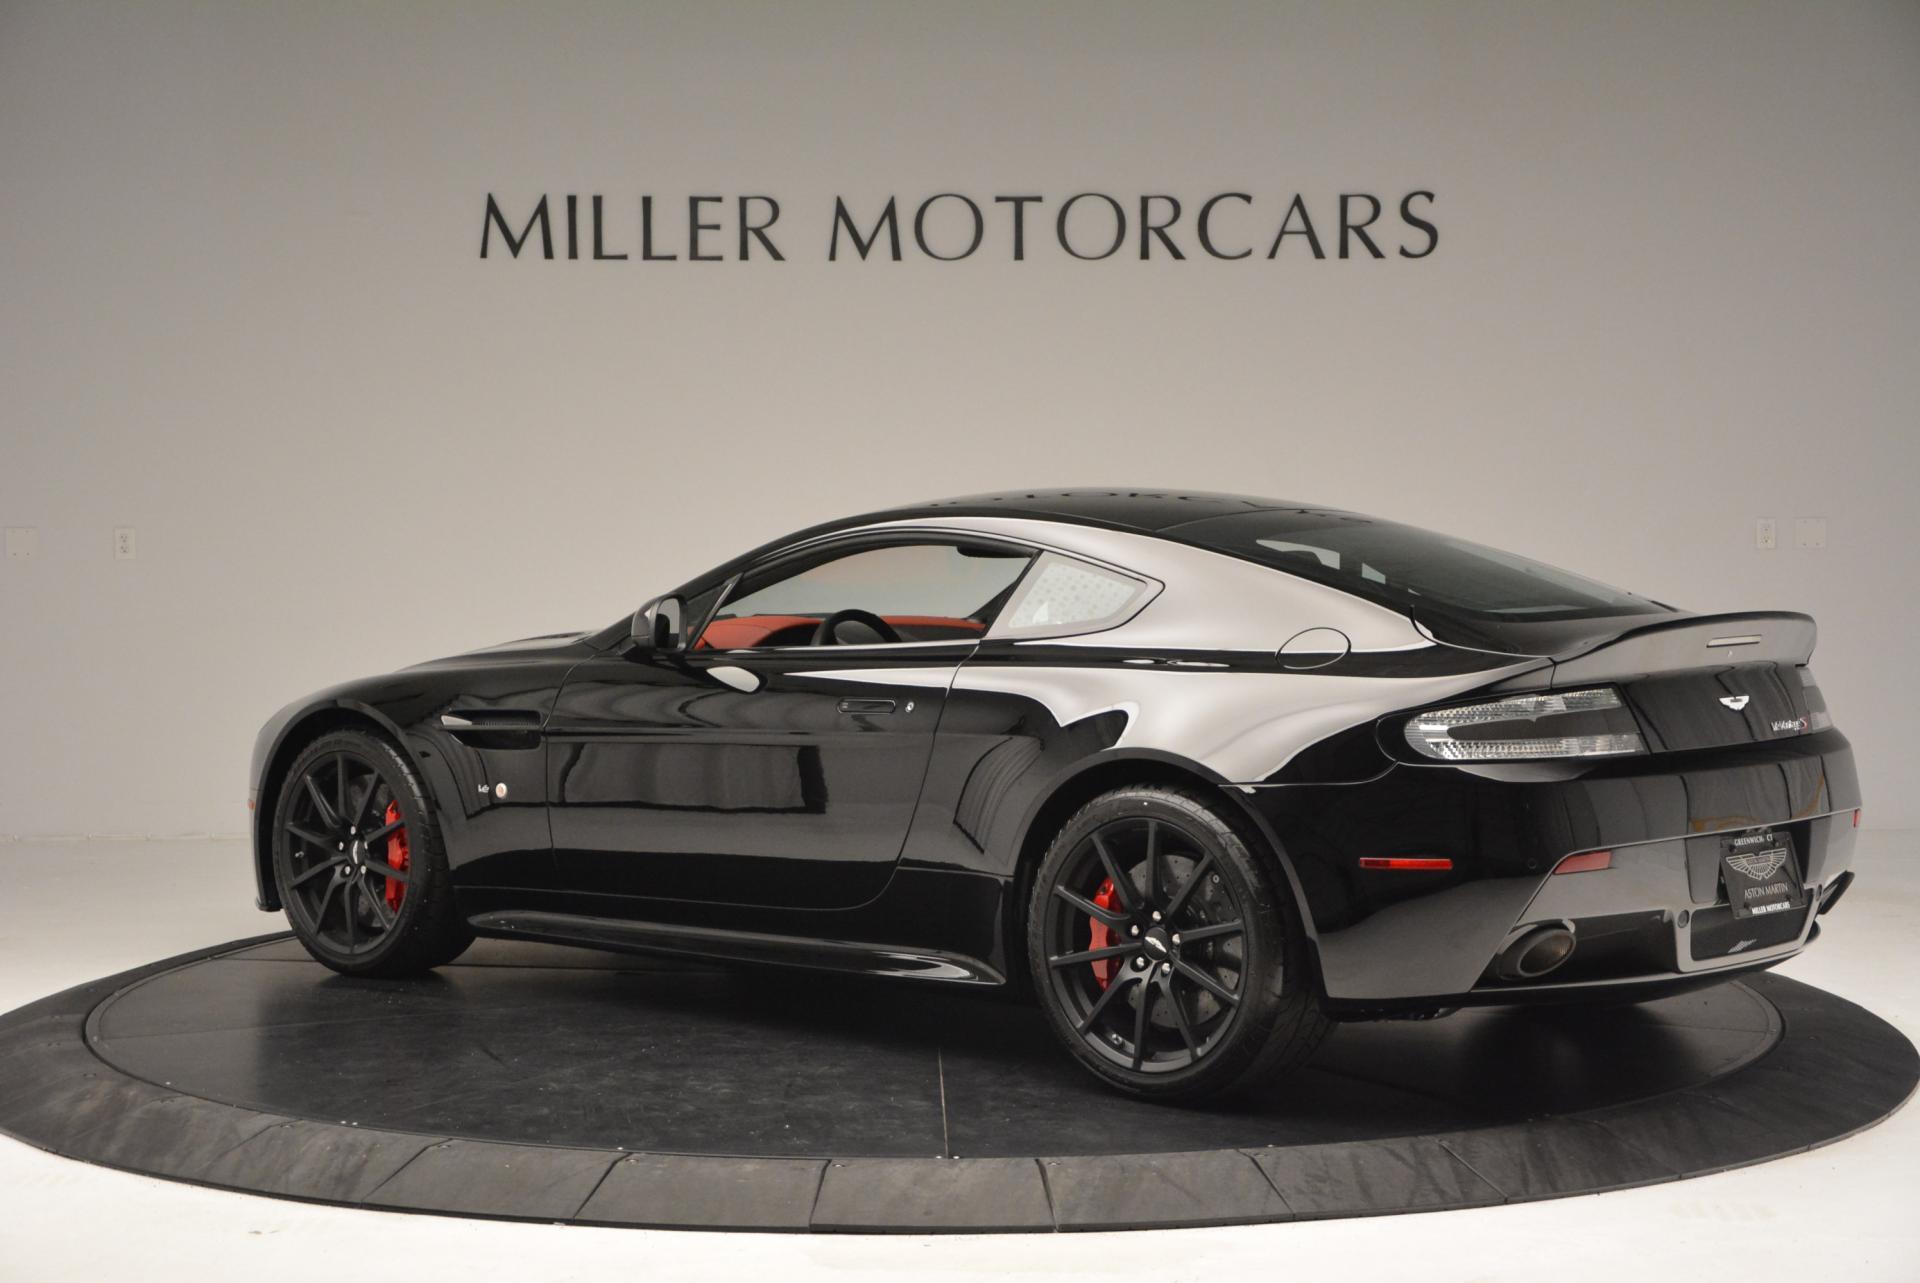 New 2015 Aston Martin V12 Vantage S  For Sale In Greenwich, CT 103_p4